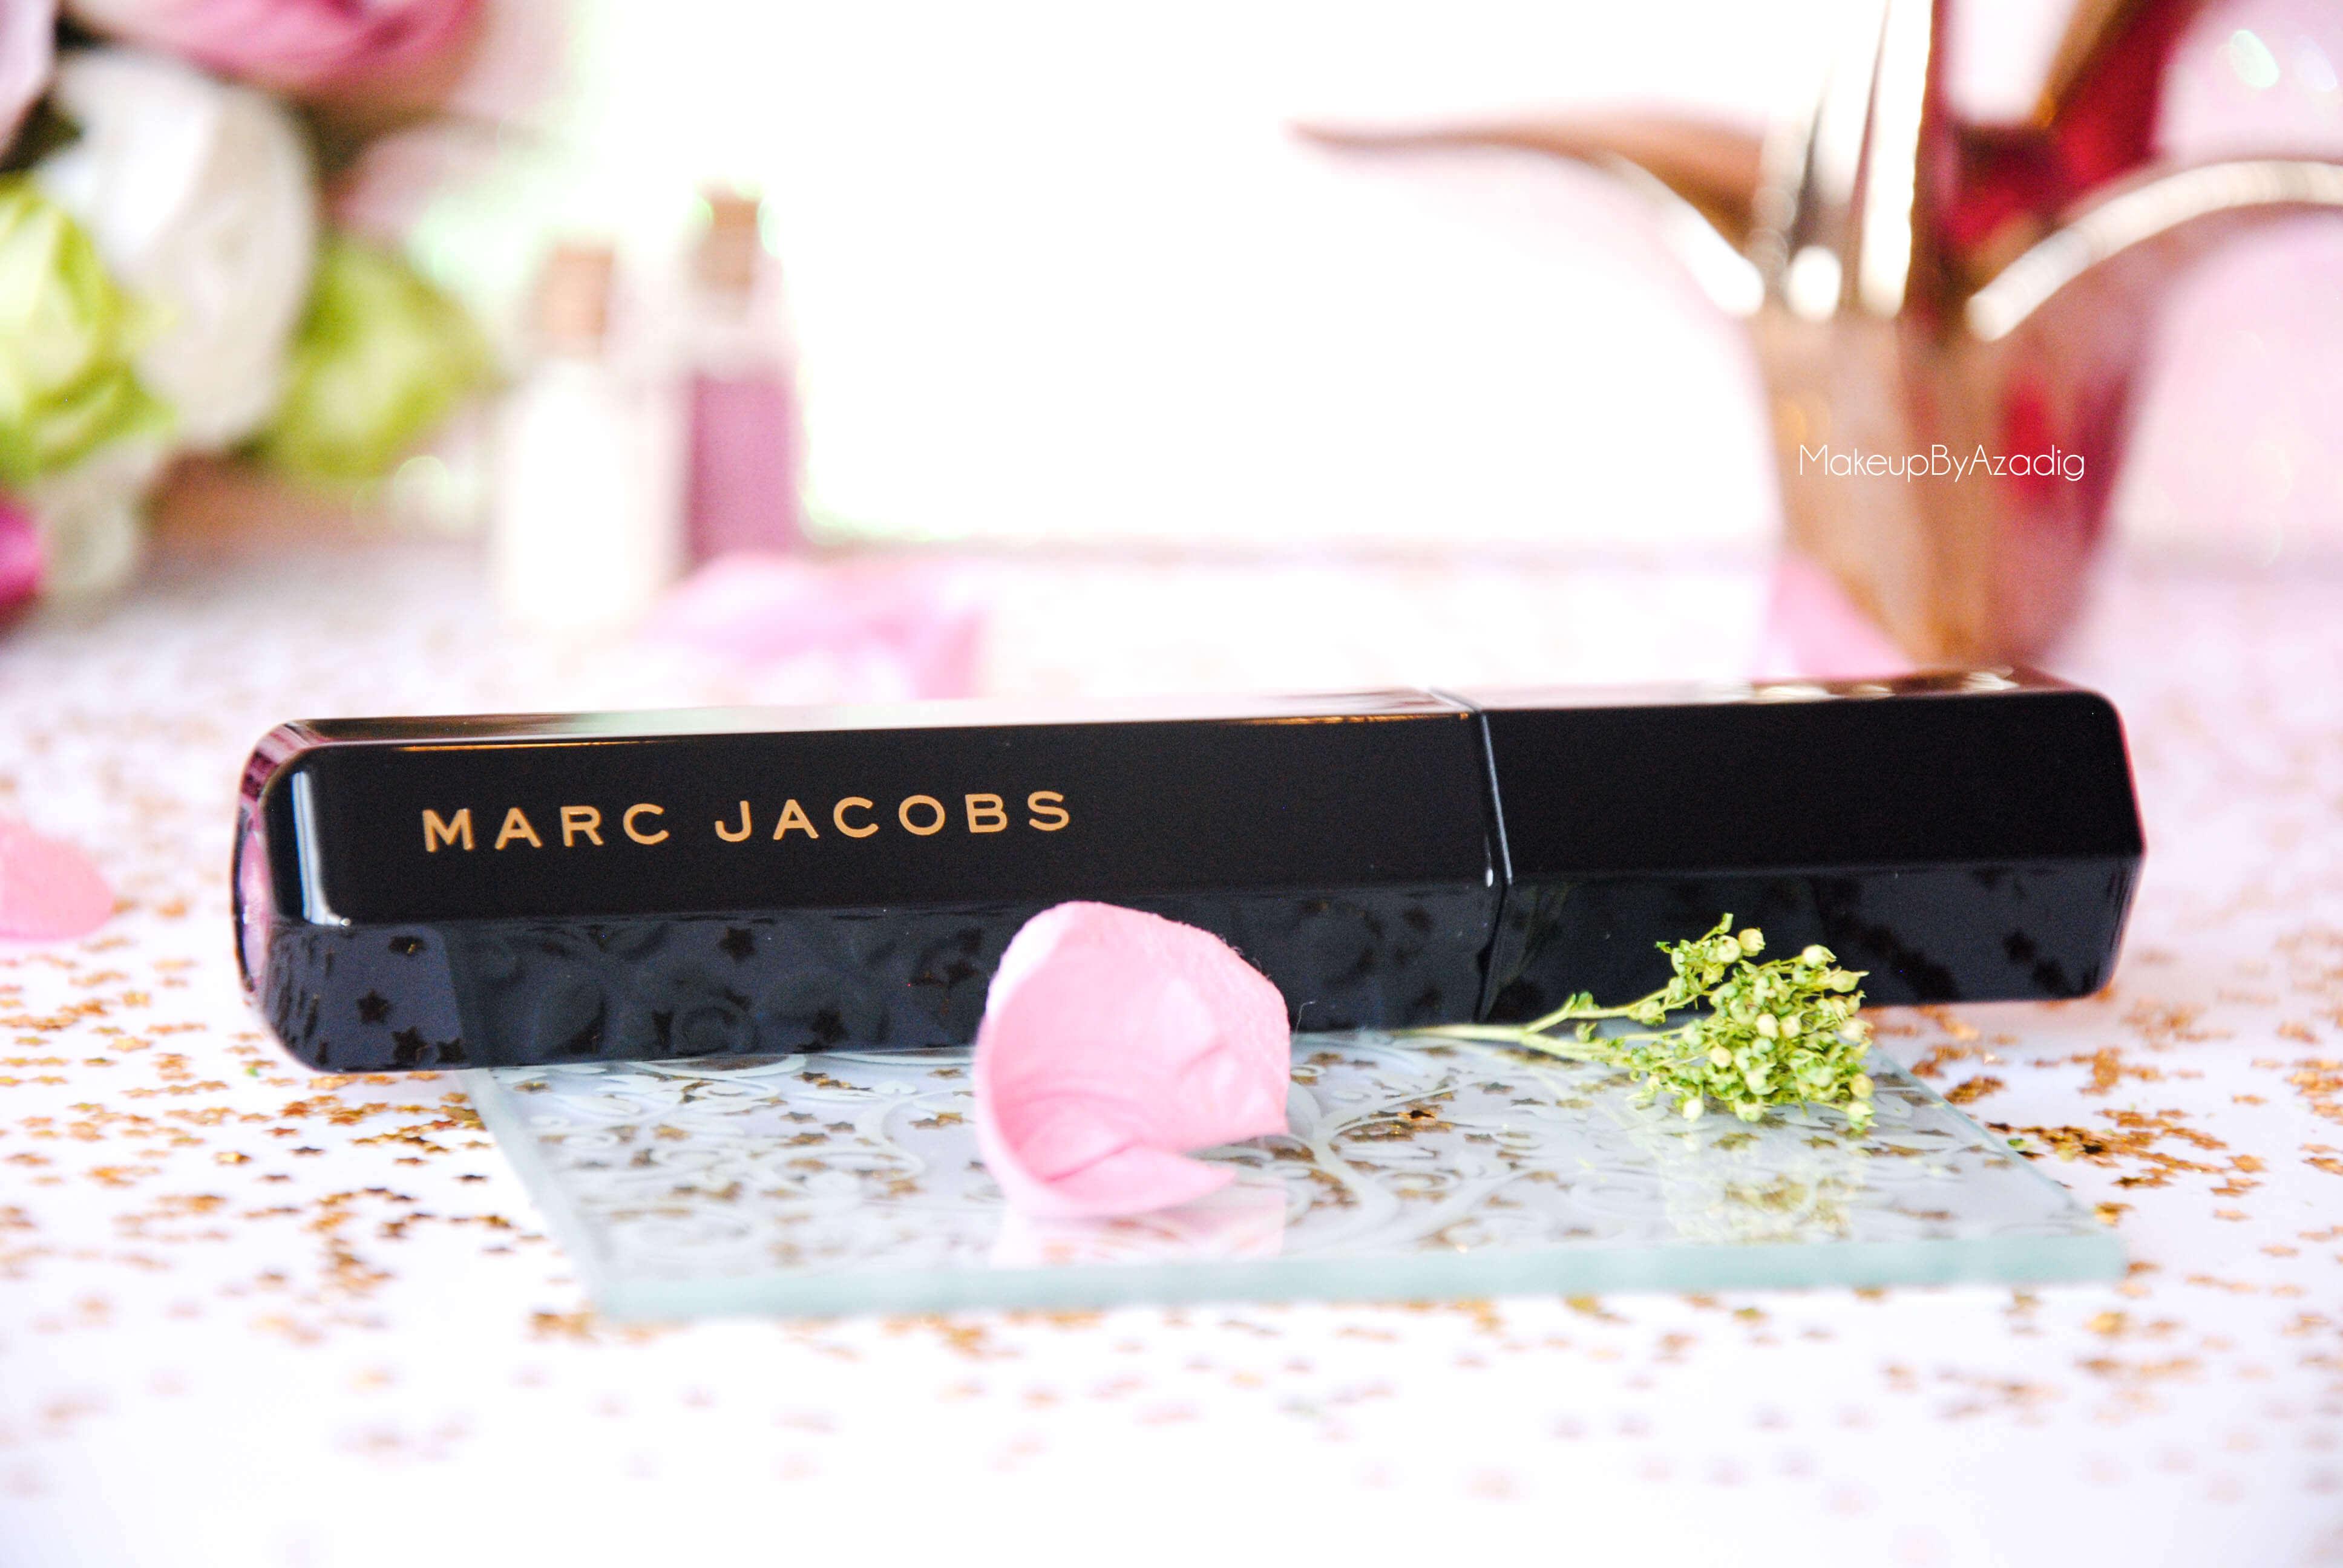 velvet noir-volume spectaculaire-marc jacobs-makeupbyazadig-revue-review-mascara-noir intense-best